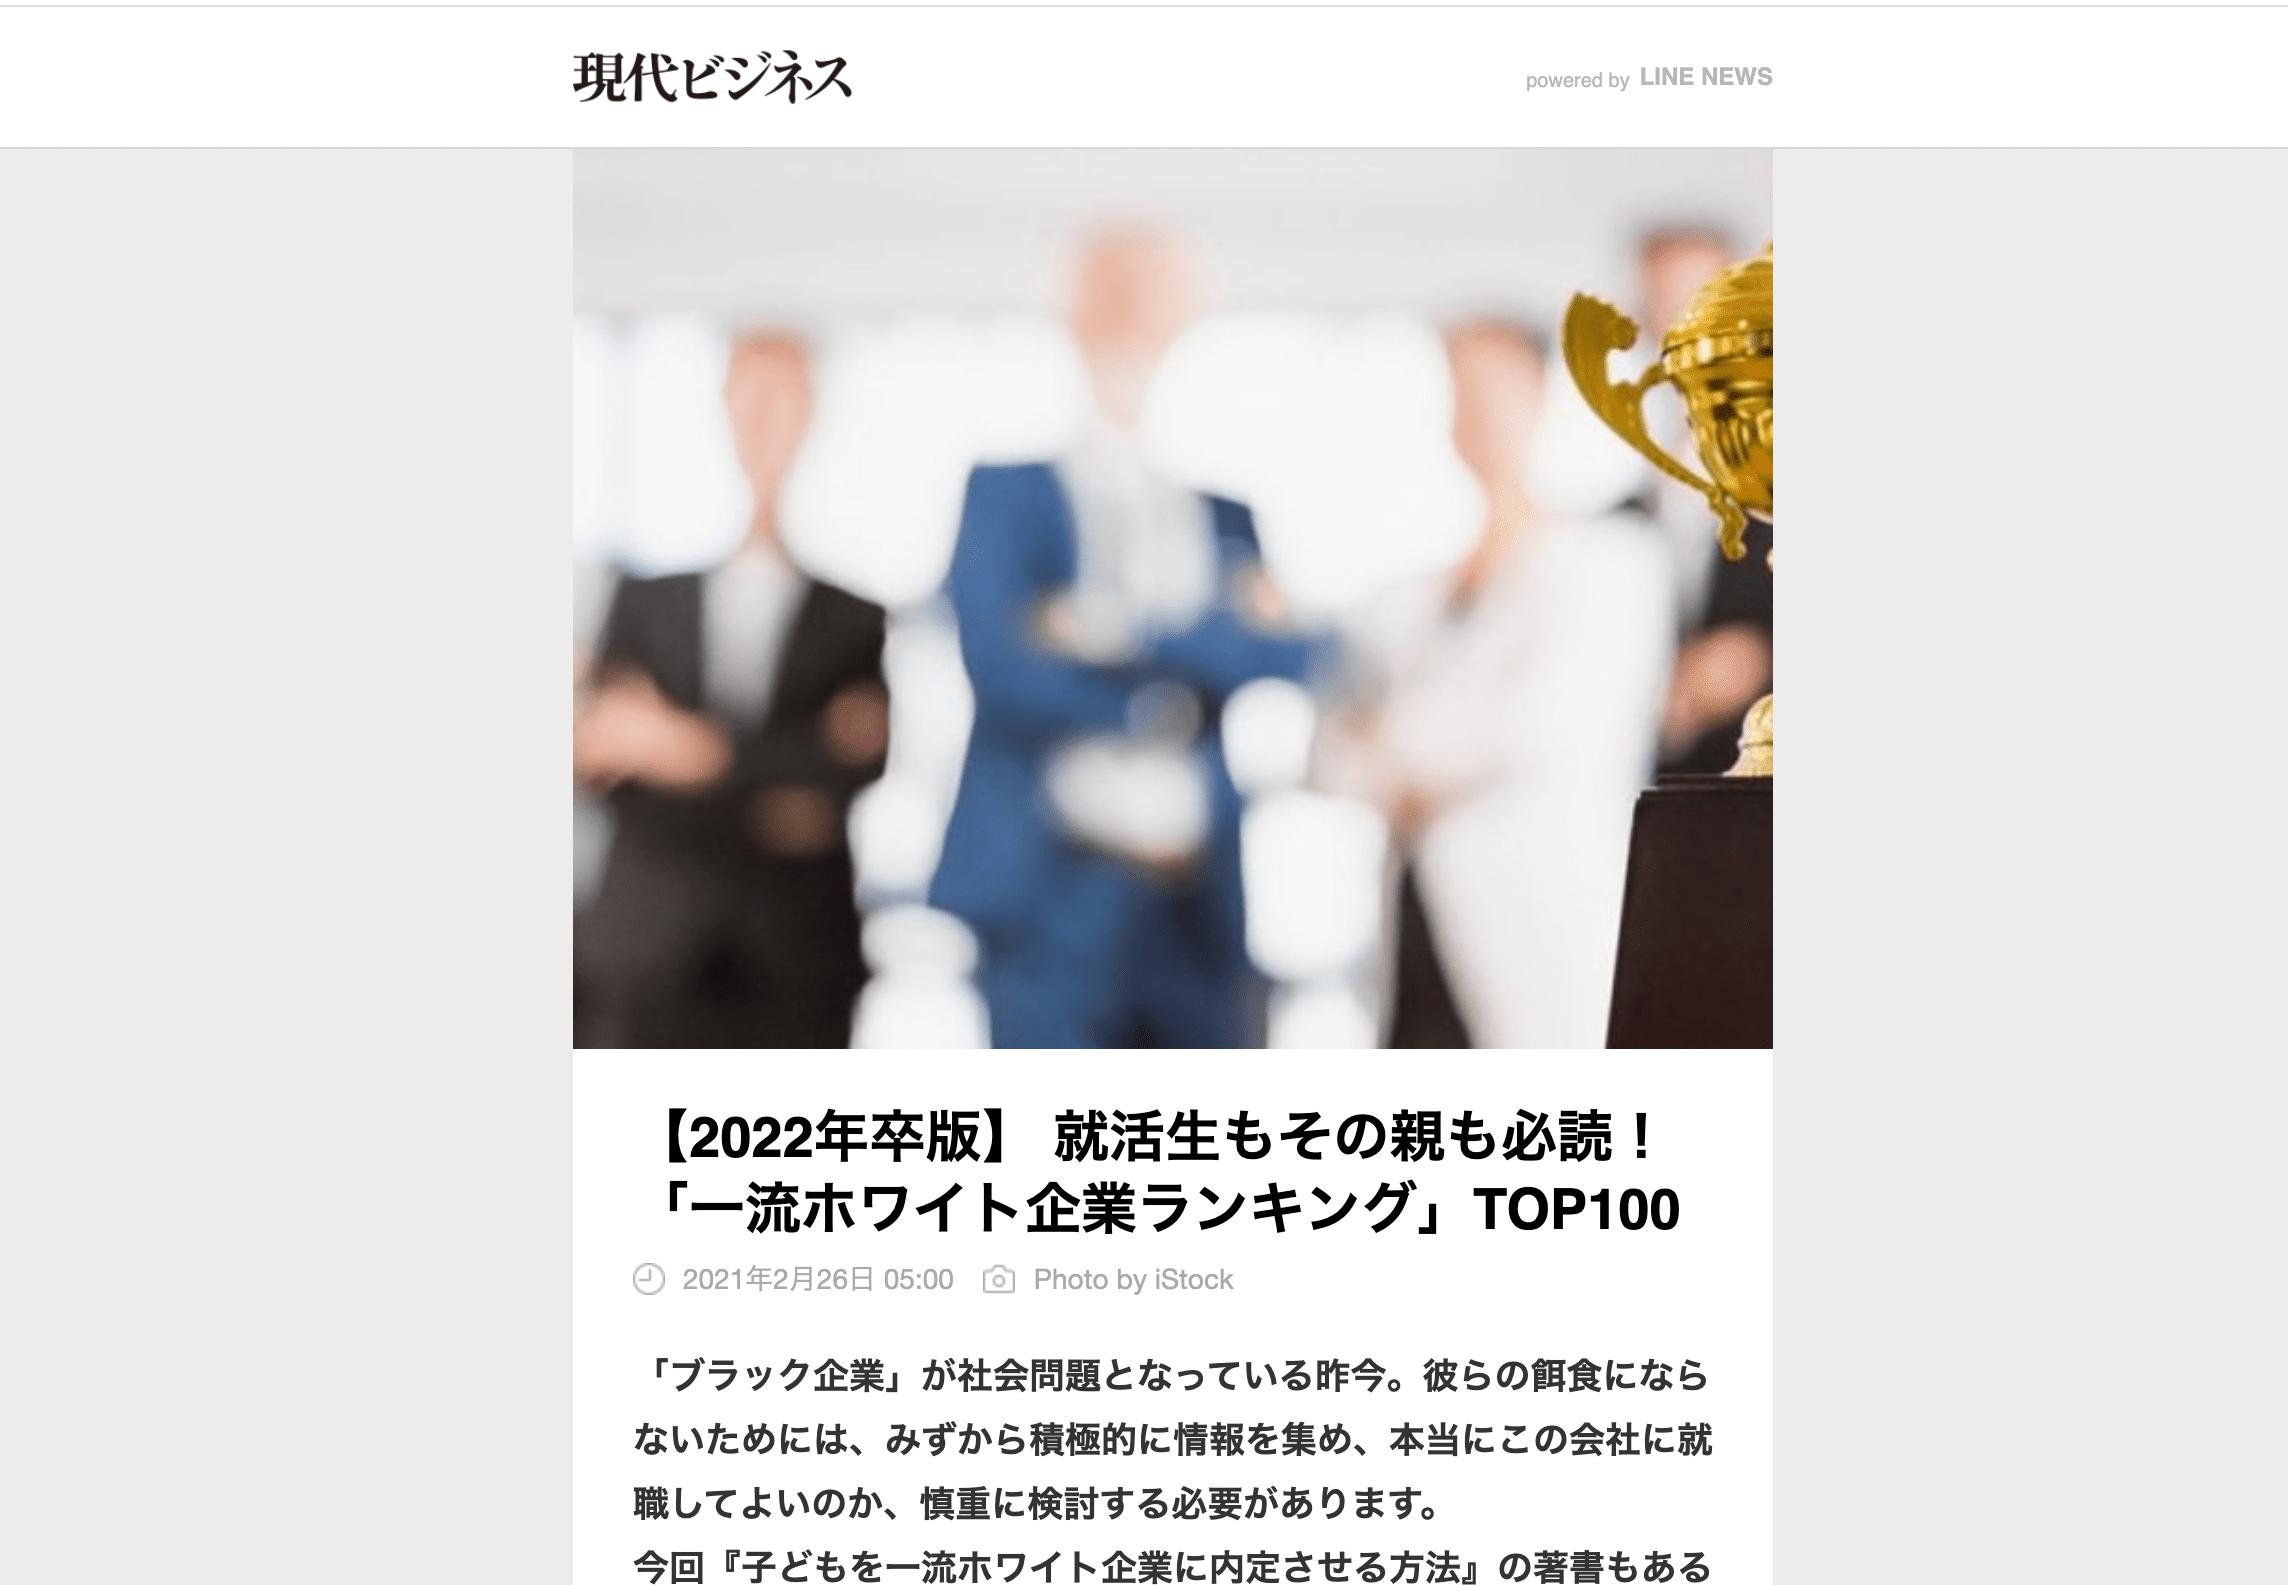 LINENEWSでの紹介記事